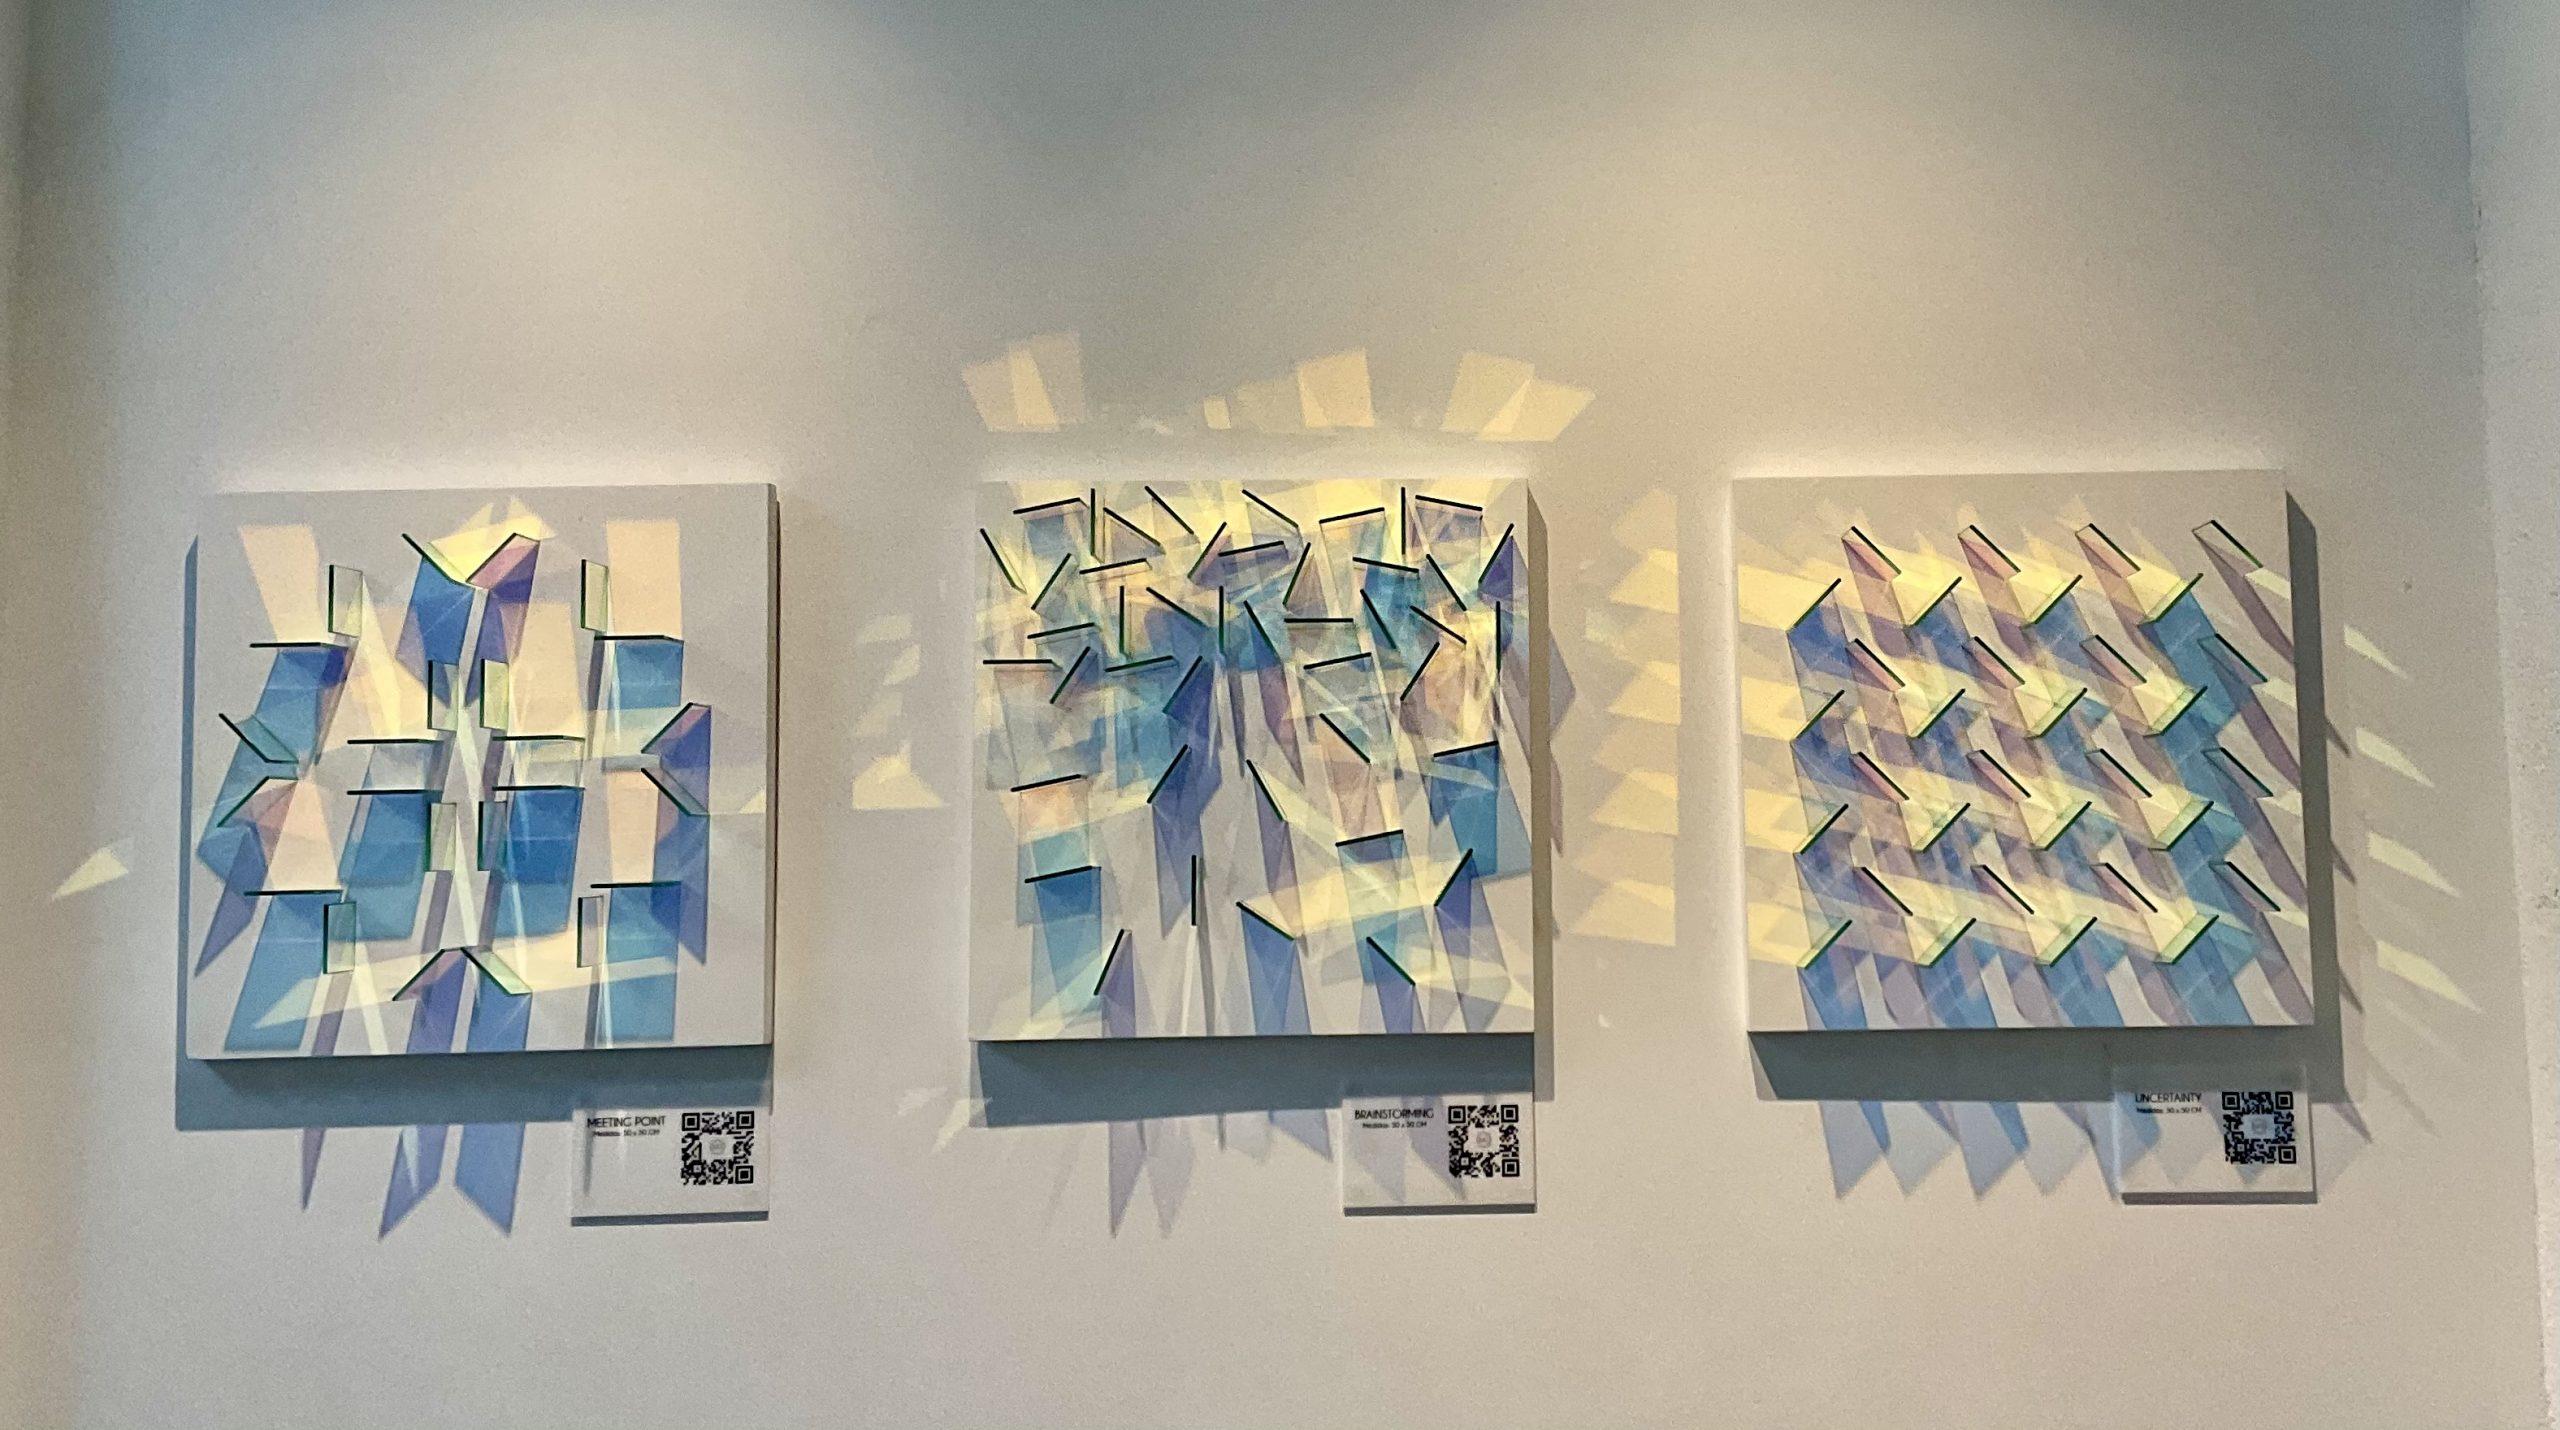 El arte 'inconfinable' de Mercedes Guenun